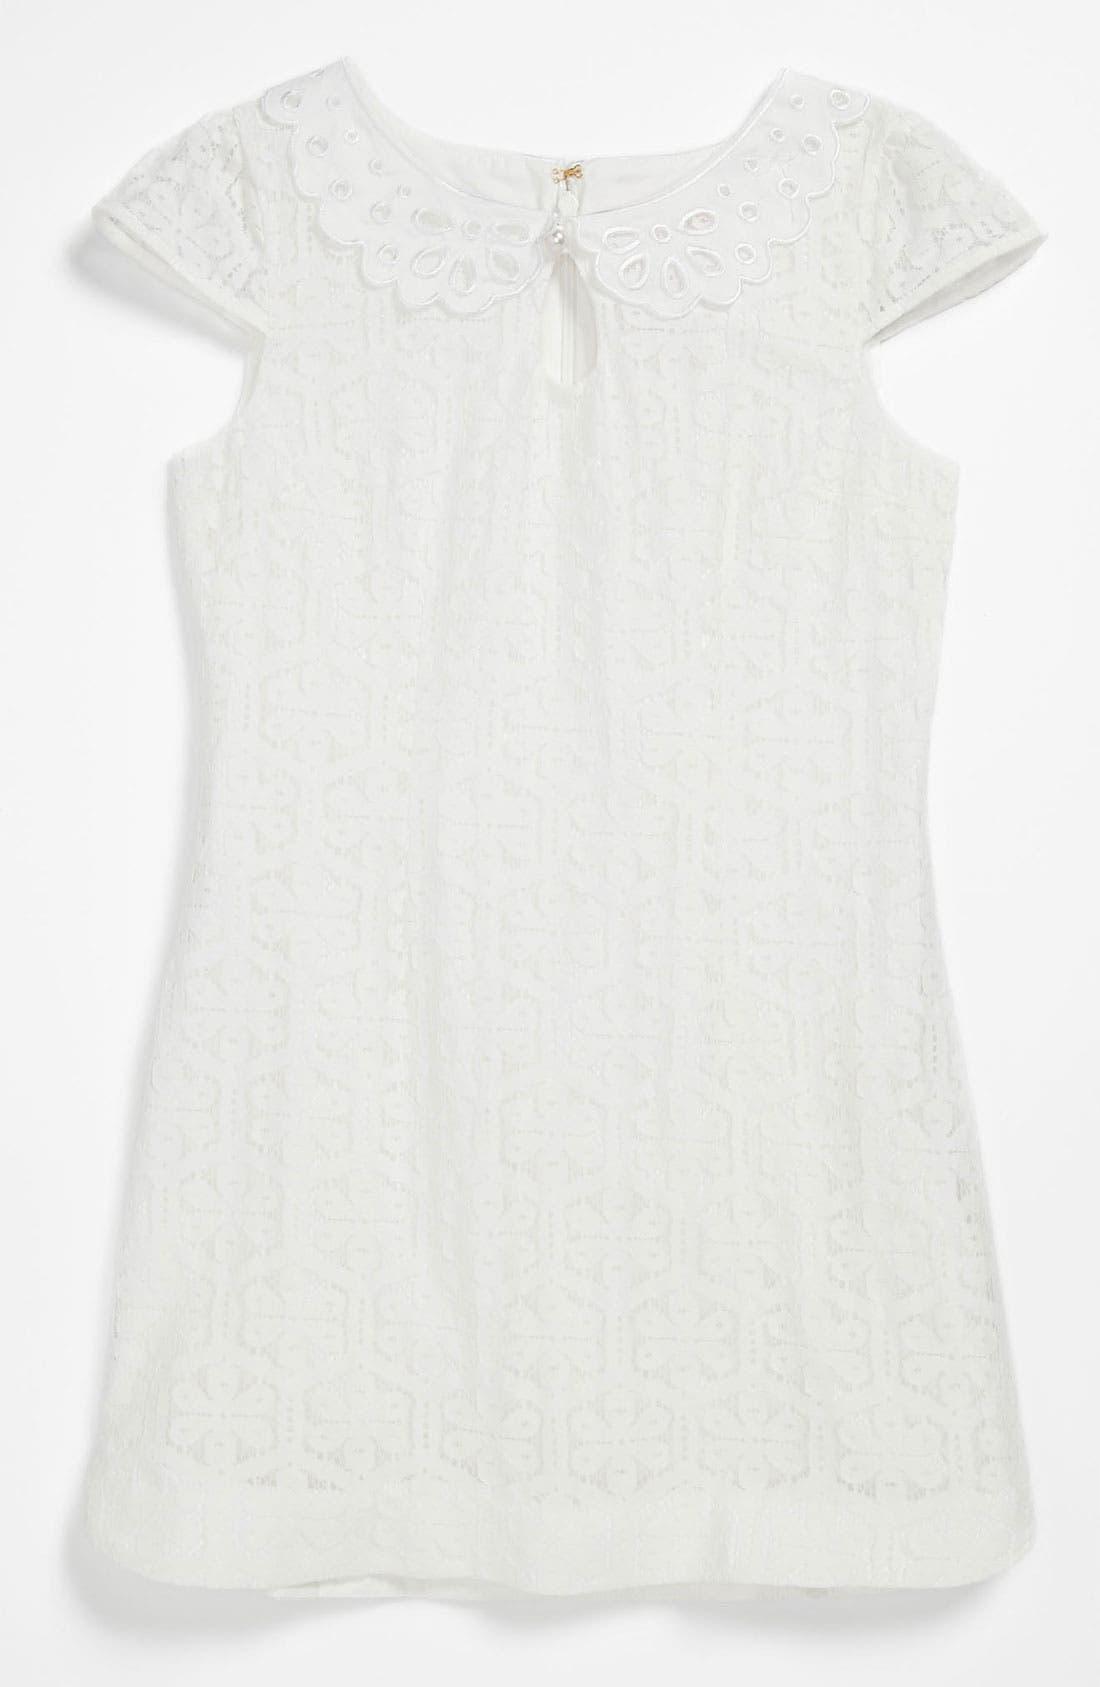 Alternate Image 1 Selected - Lilly Pulitzer® 'Mini Nicci' Dress (Little Girls & Big Girls)